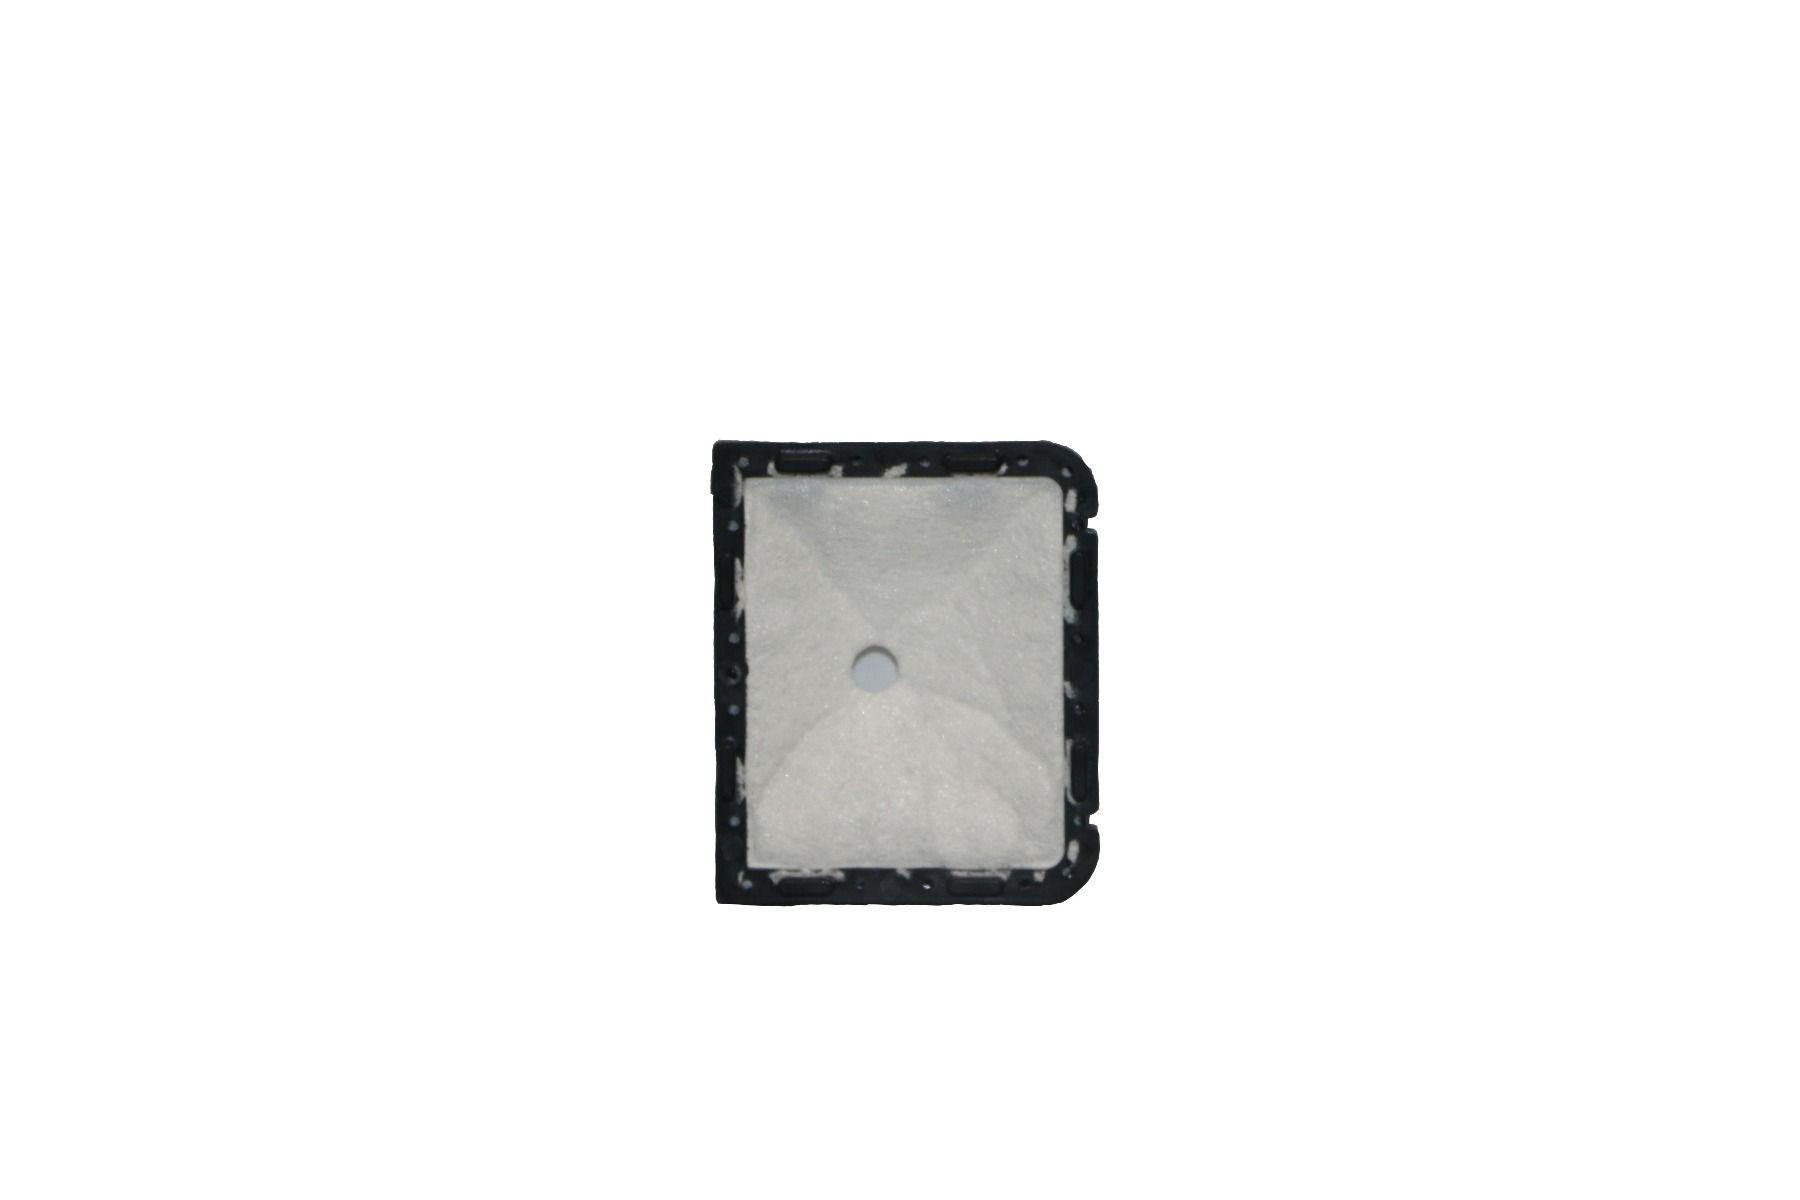 Shindaiwa A226000600 Heavy Duty Air Filter